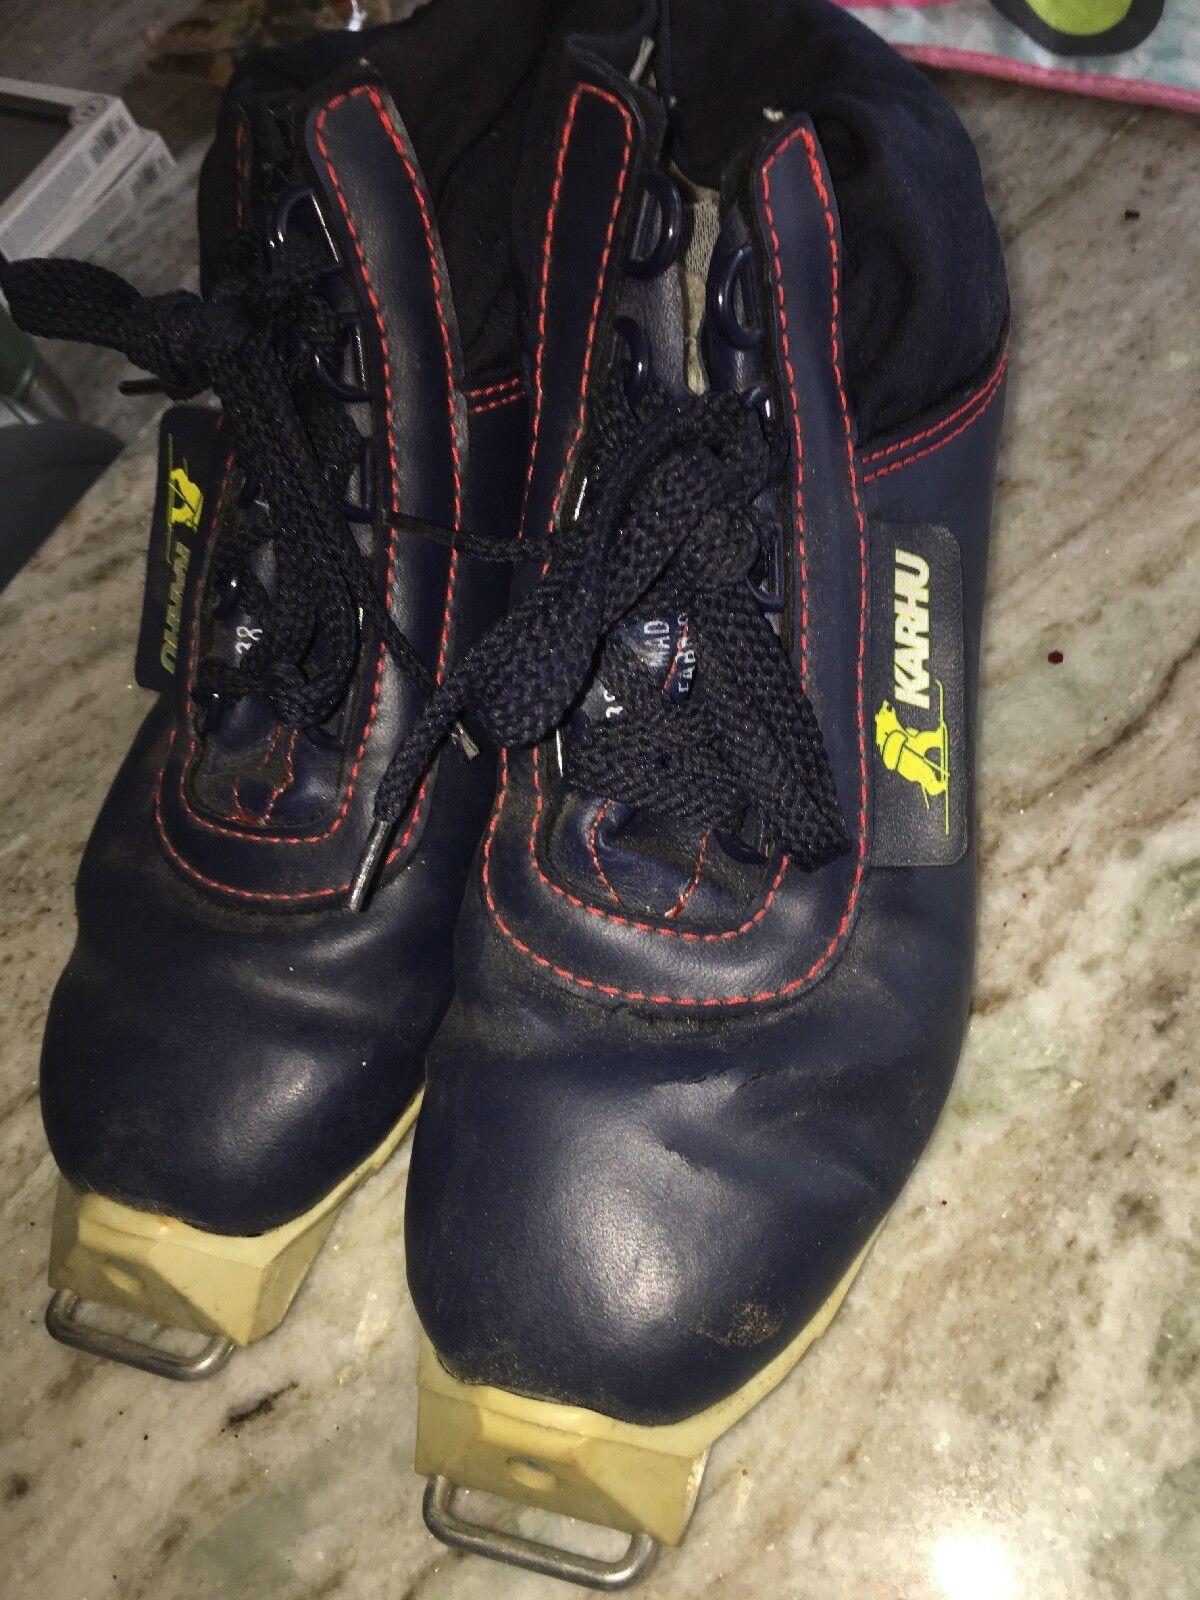 Cross Country Ski Boots SNS Size 38 Karhu XC